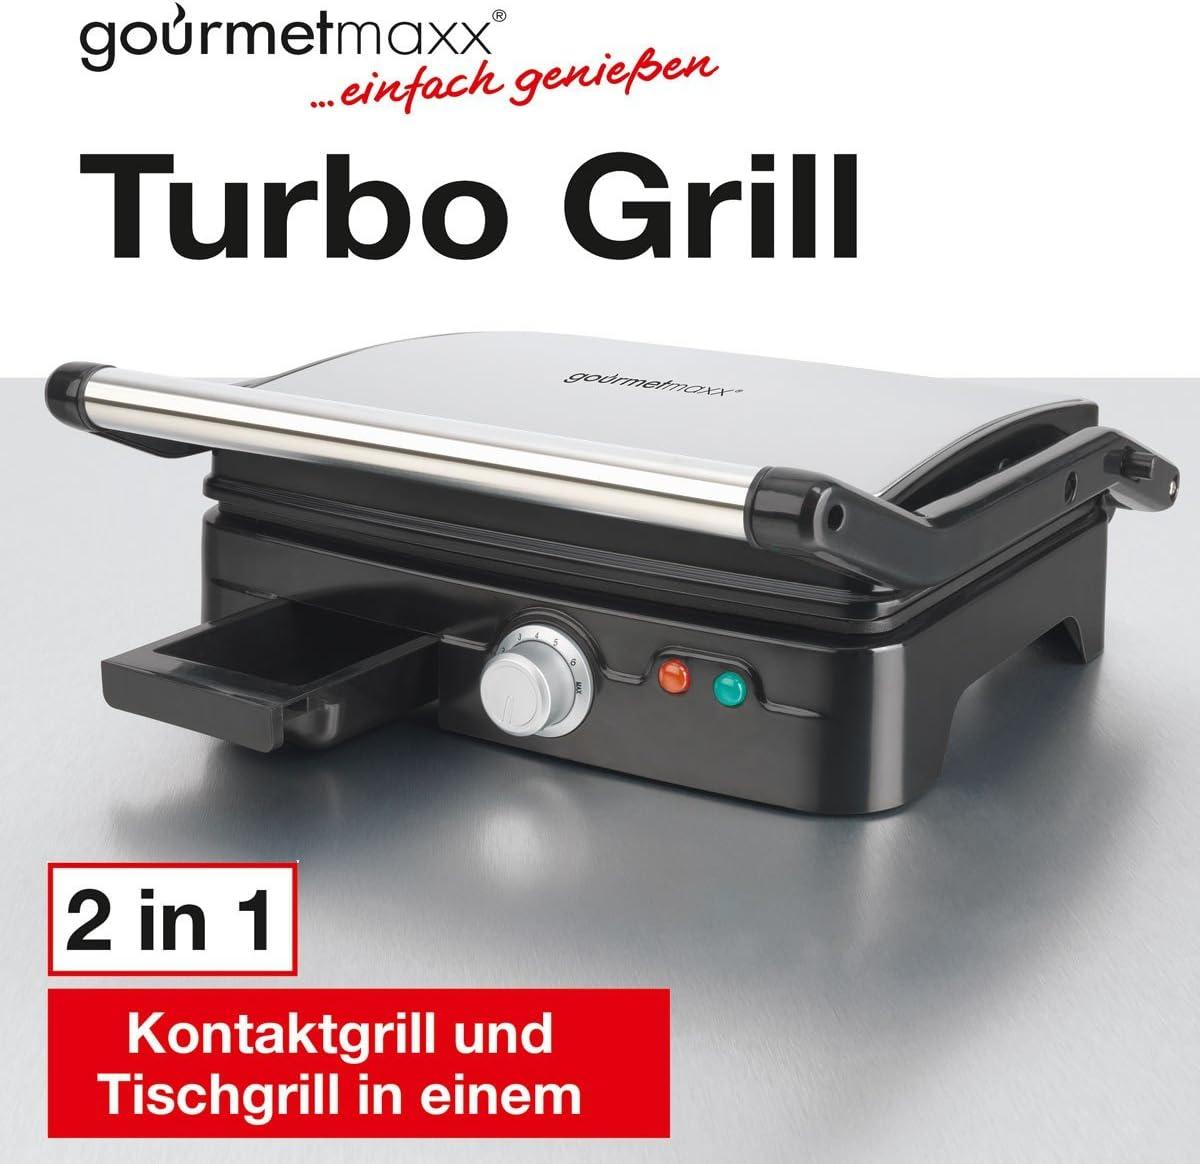 TV Unser Original 07301 Gourmetmaxx Turbo Barbecue avec